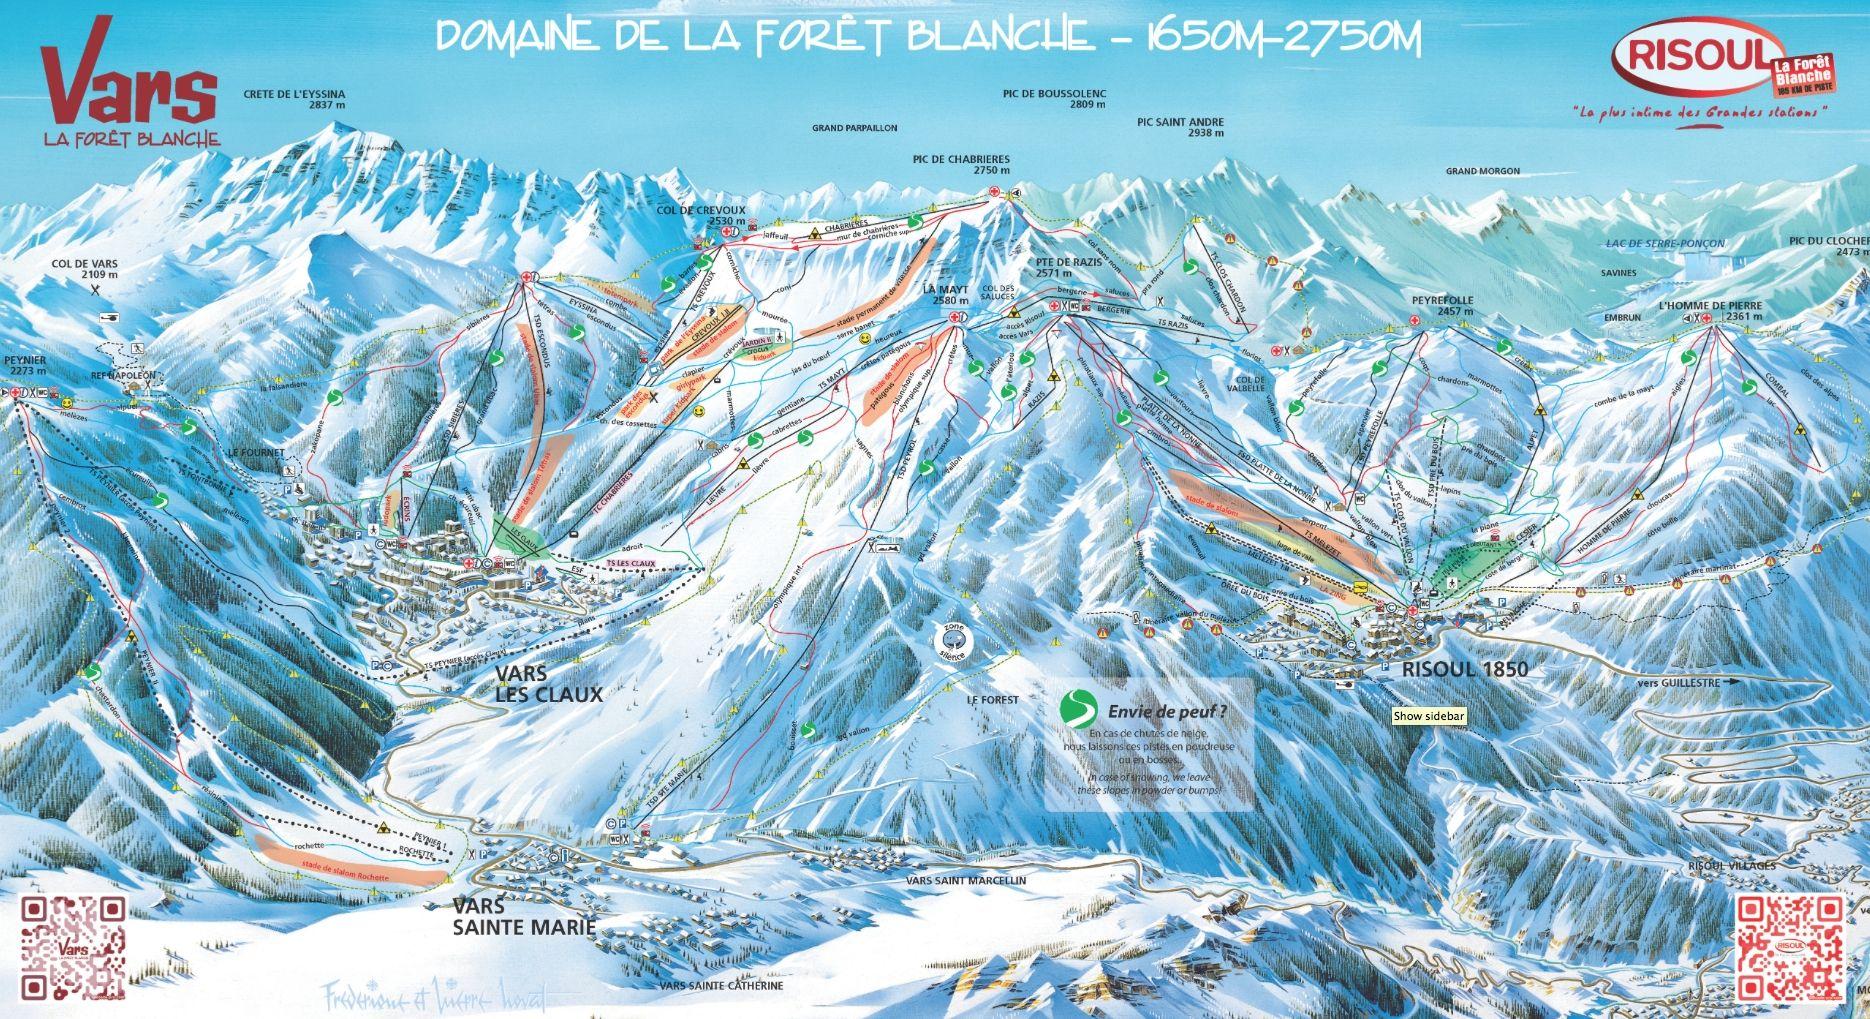 Afbeeldingsresultaat voor risoul skikaart